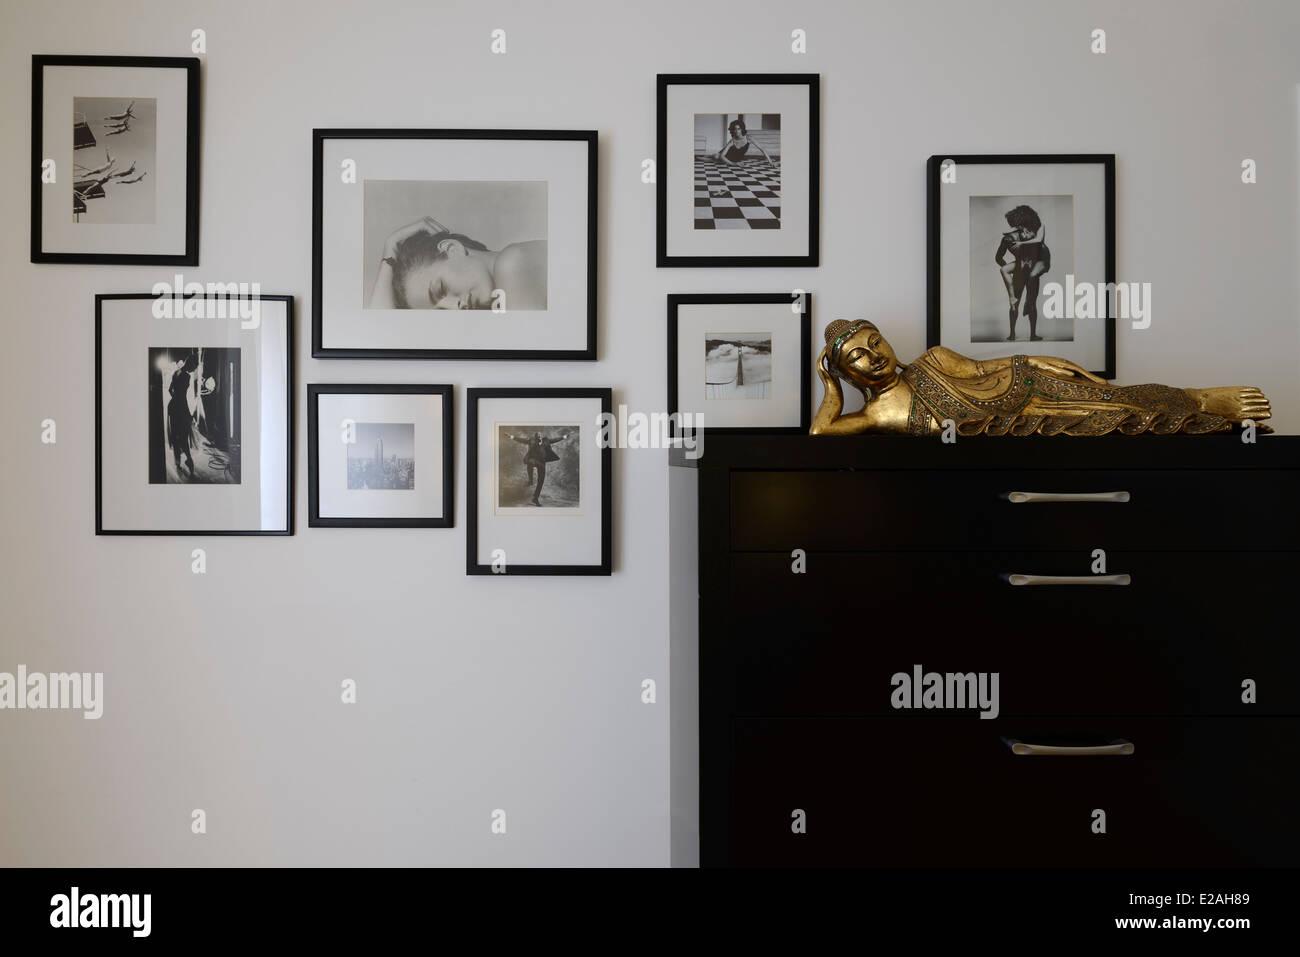 Framed photos on a wall - Stock Image